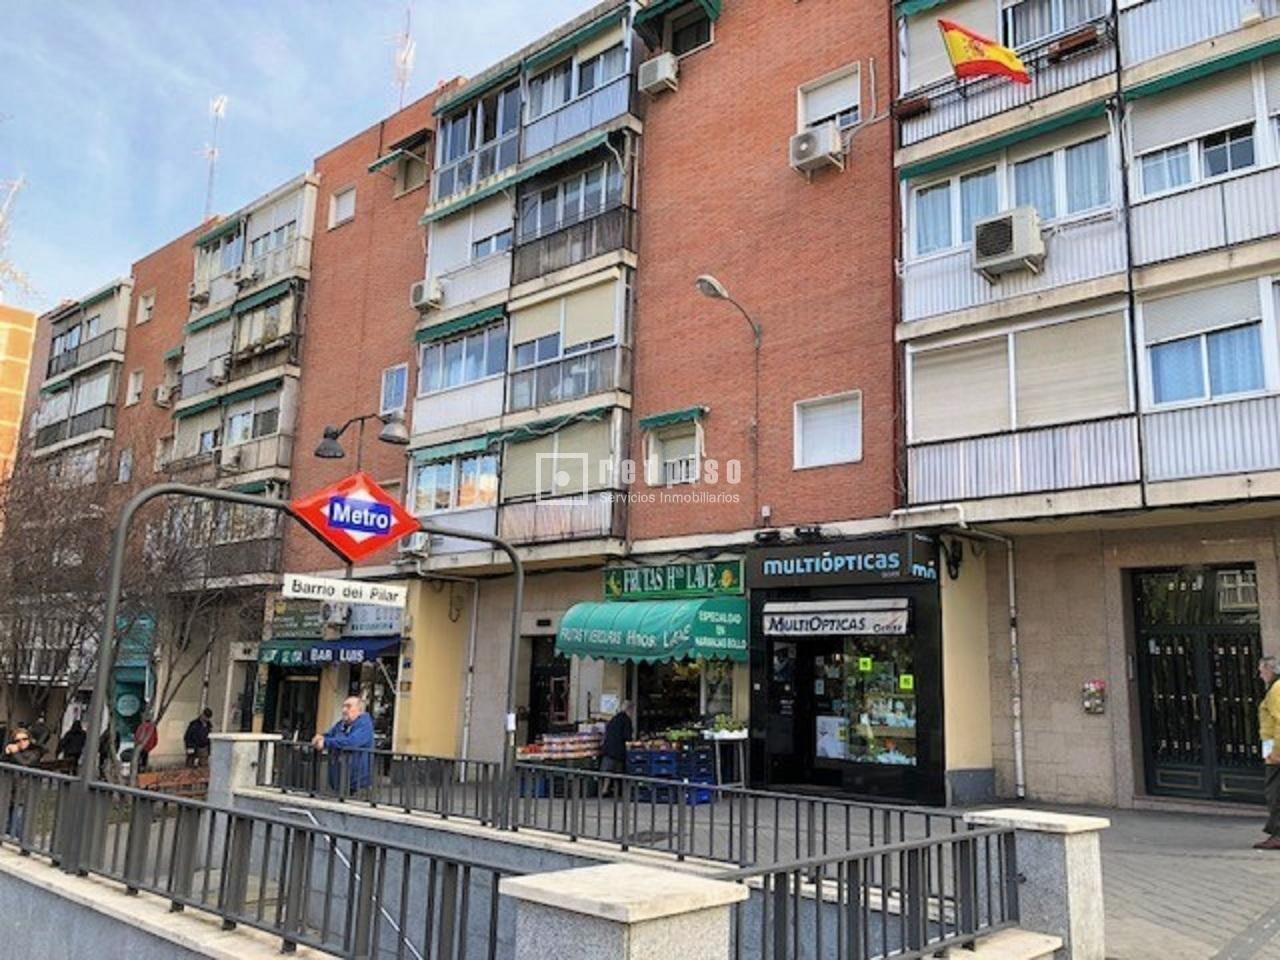 Piso barrio del pilar amazing piso zona barrio del pilar refp with piso barrio del pilar piso - Alquiler piso barrio del pilar ...